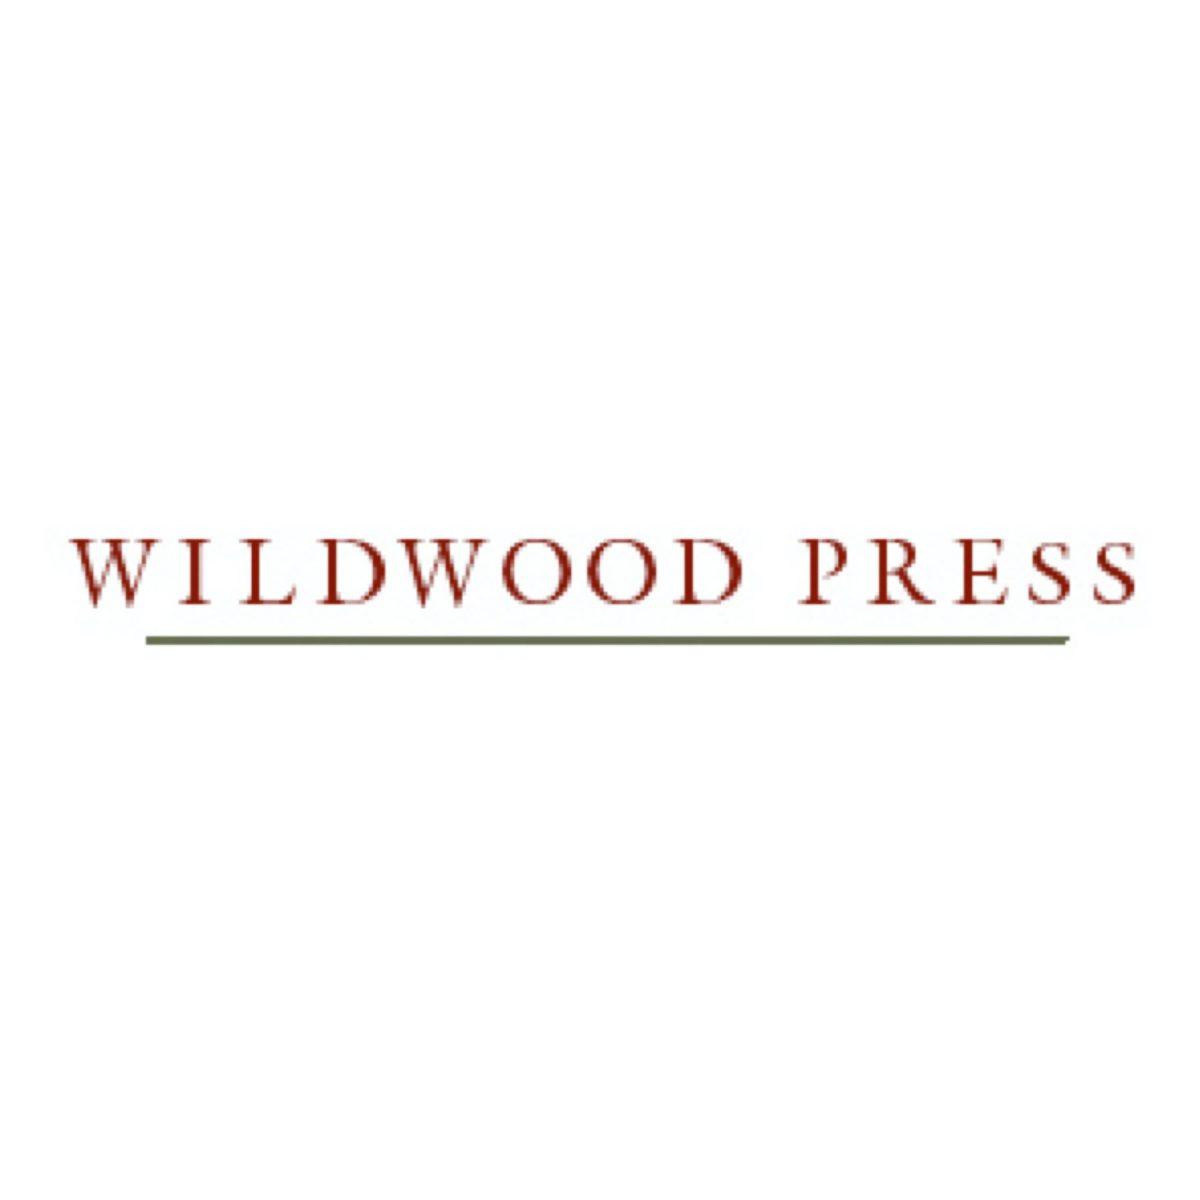 Wildwood Press LLC